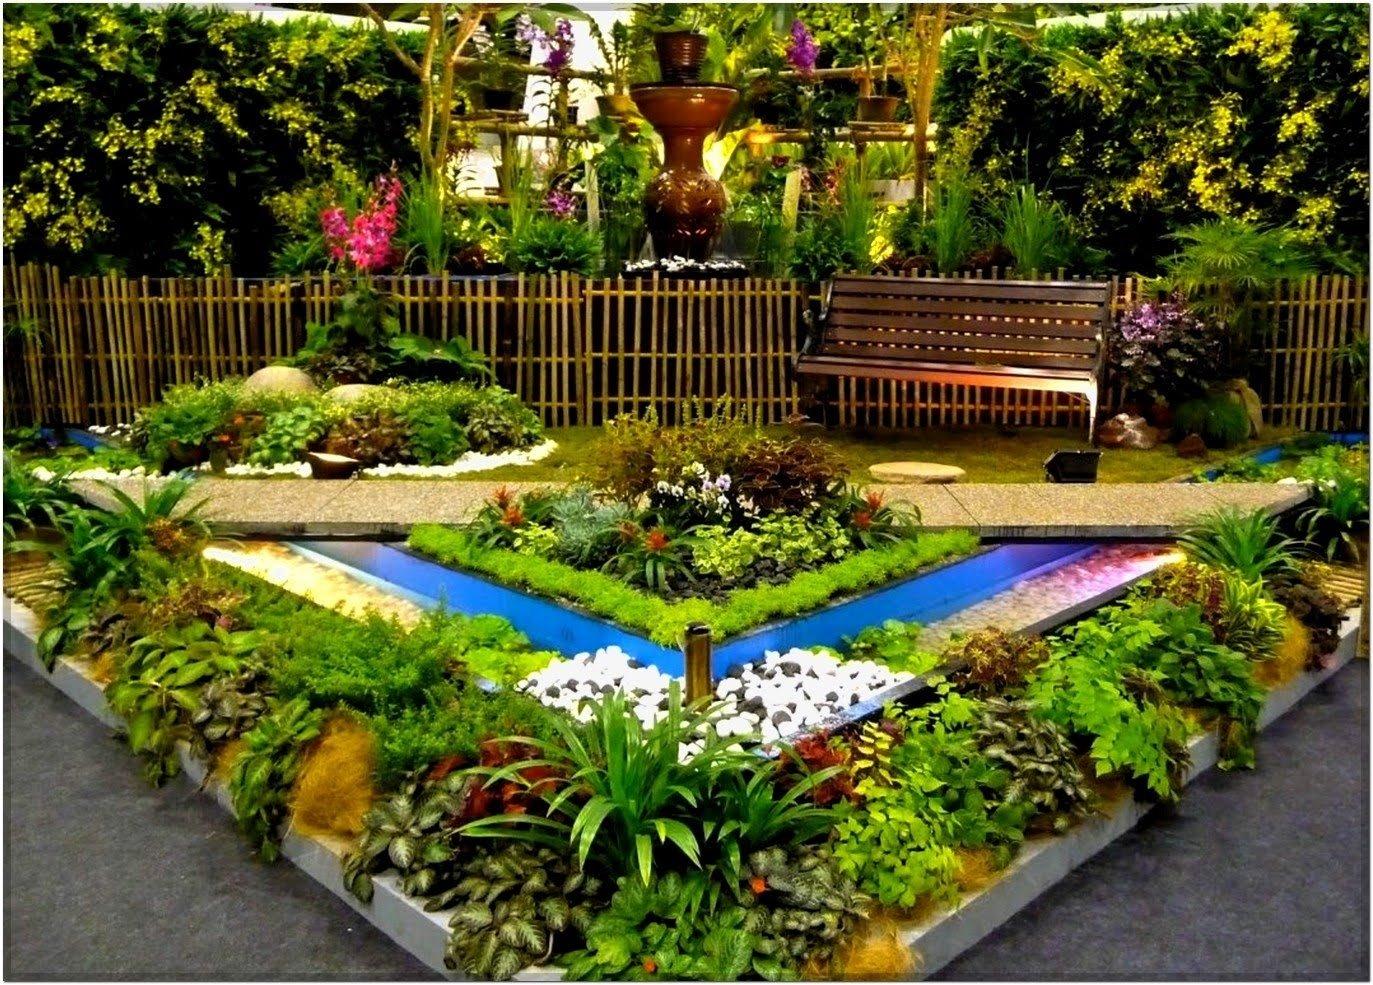 10 Perfect Garden Ideas On A Budget small garden ideas on a budget 2016 youtube 2021